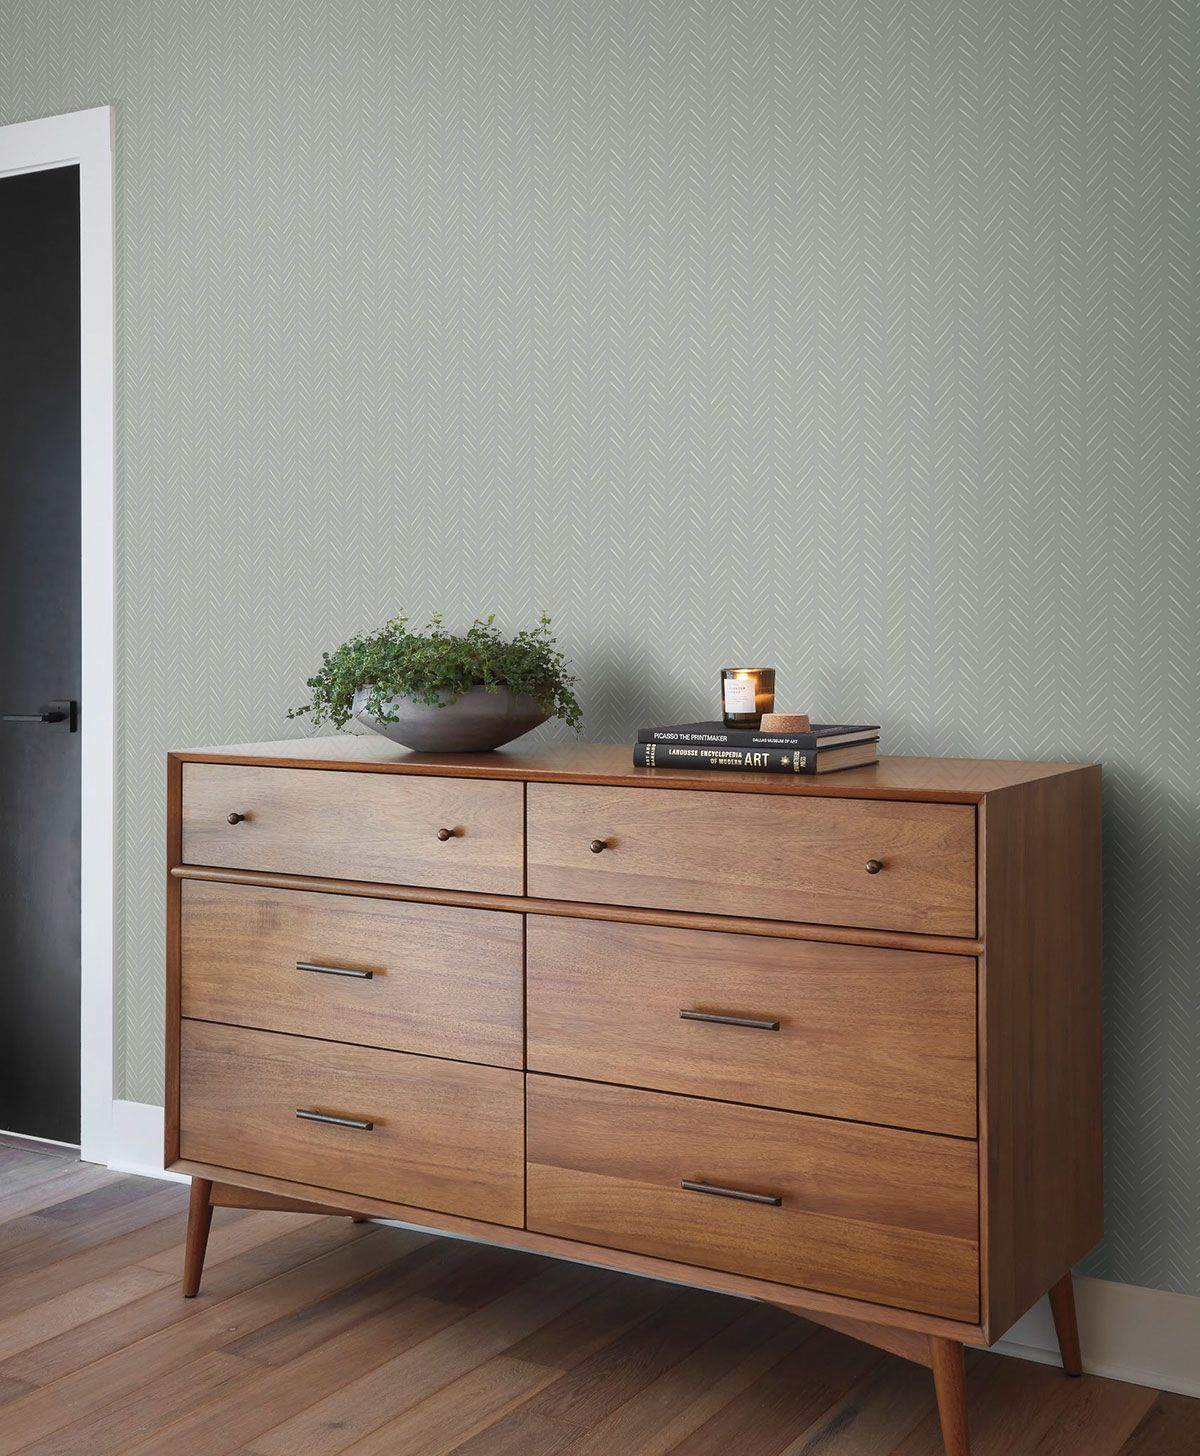 Magnolia Home PickUp Sticks Wallpaper White/Gray in